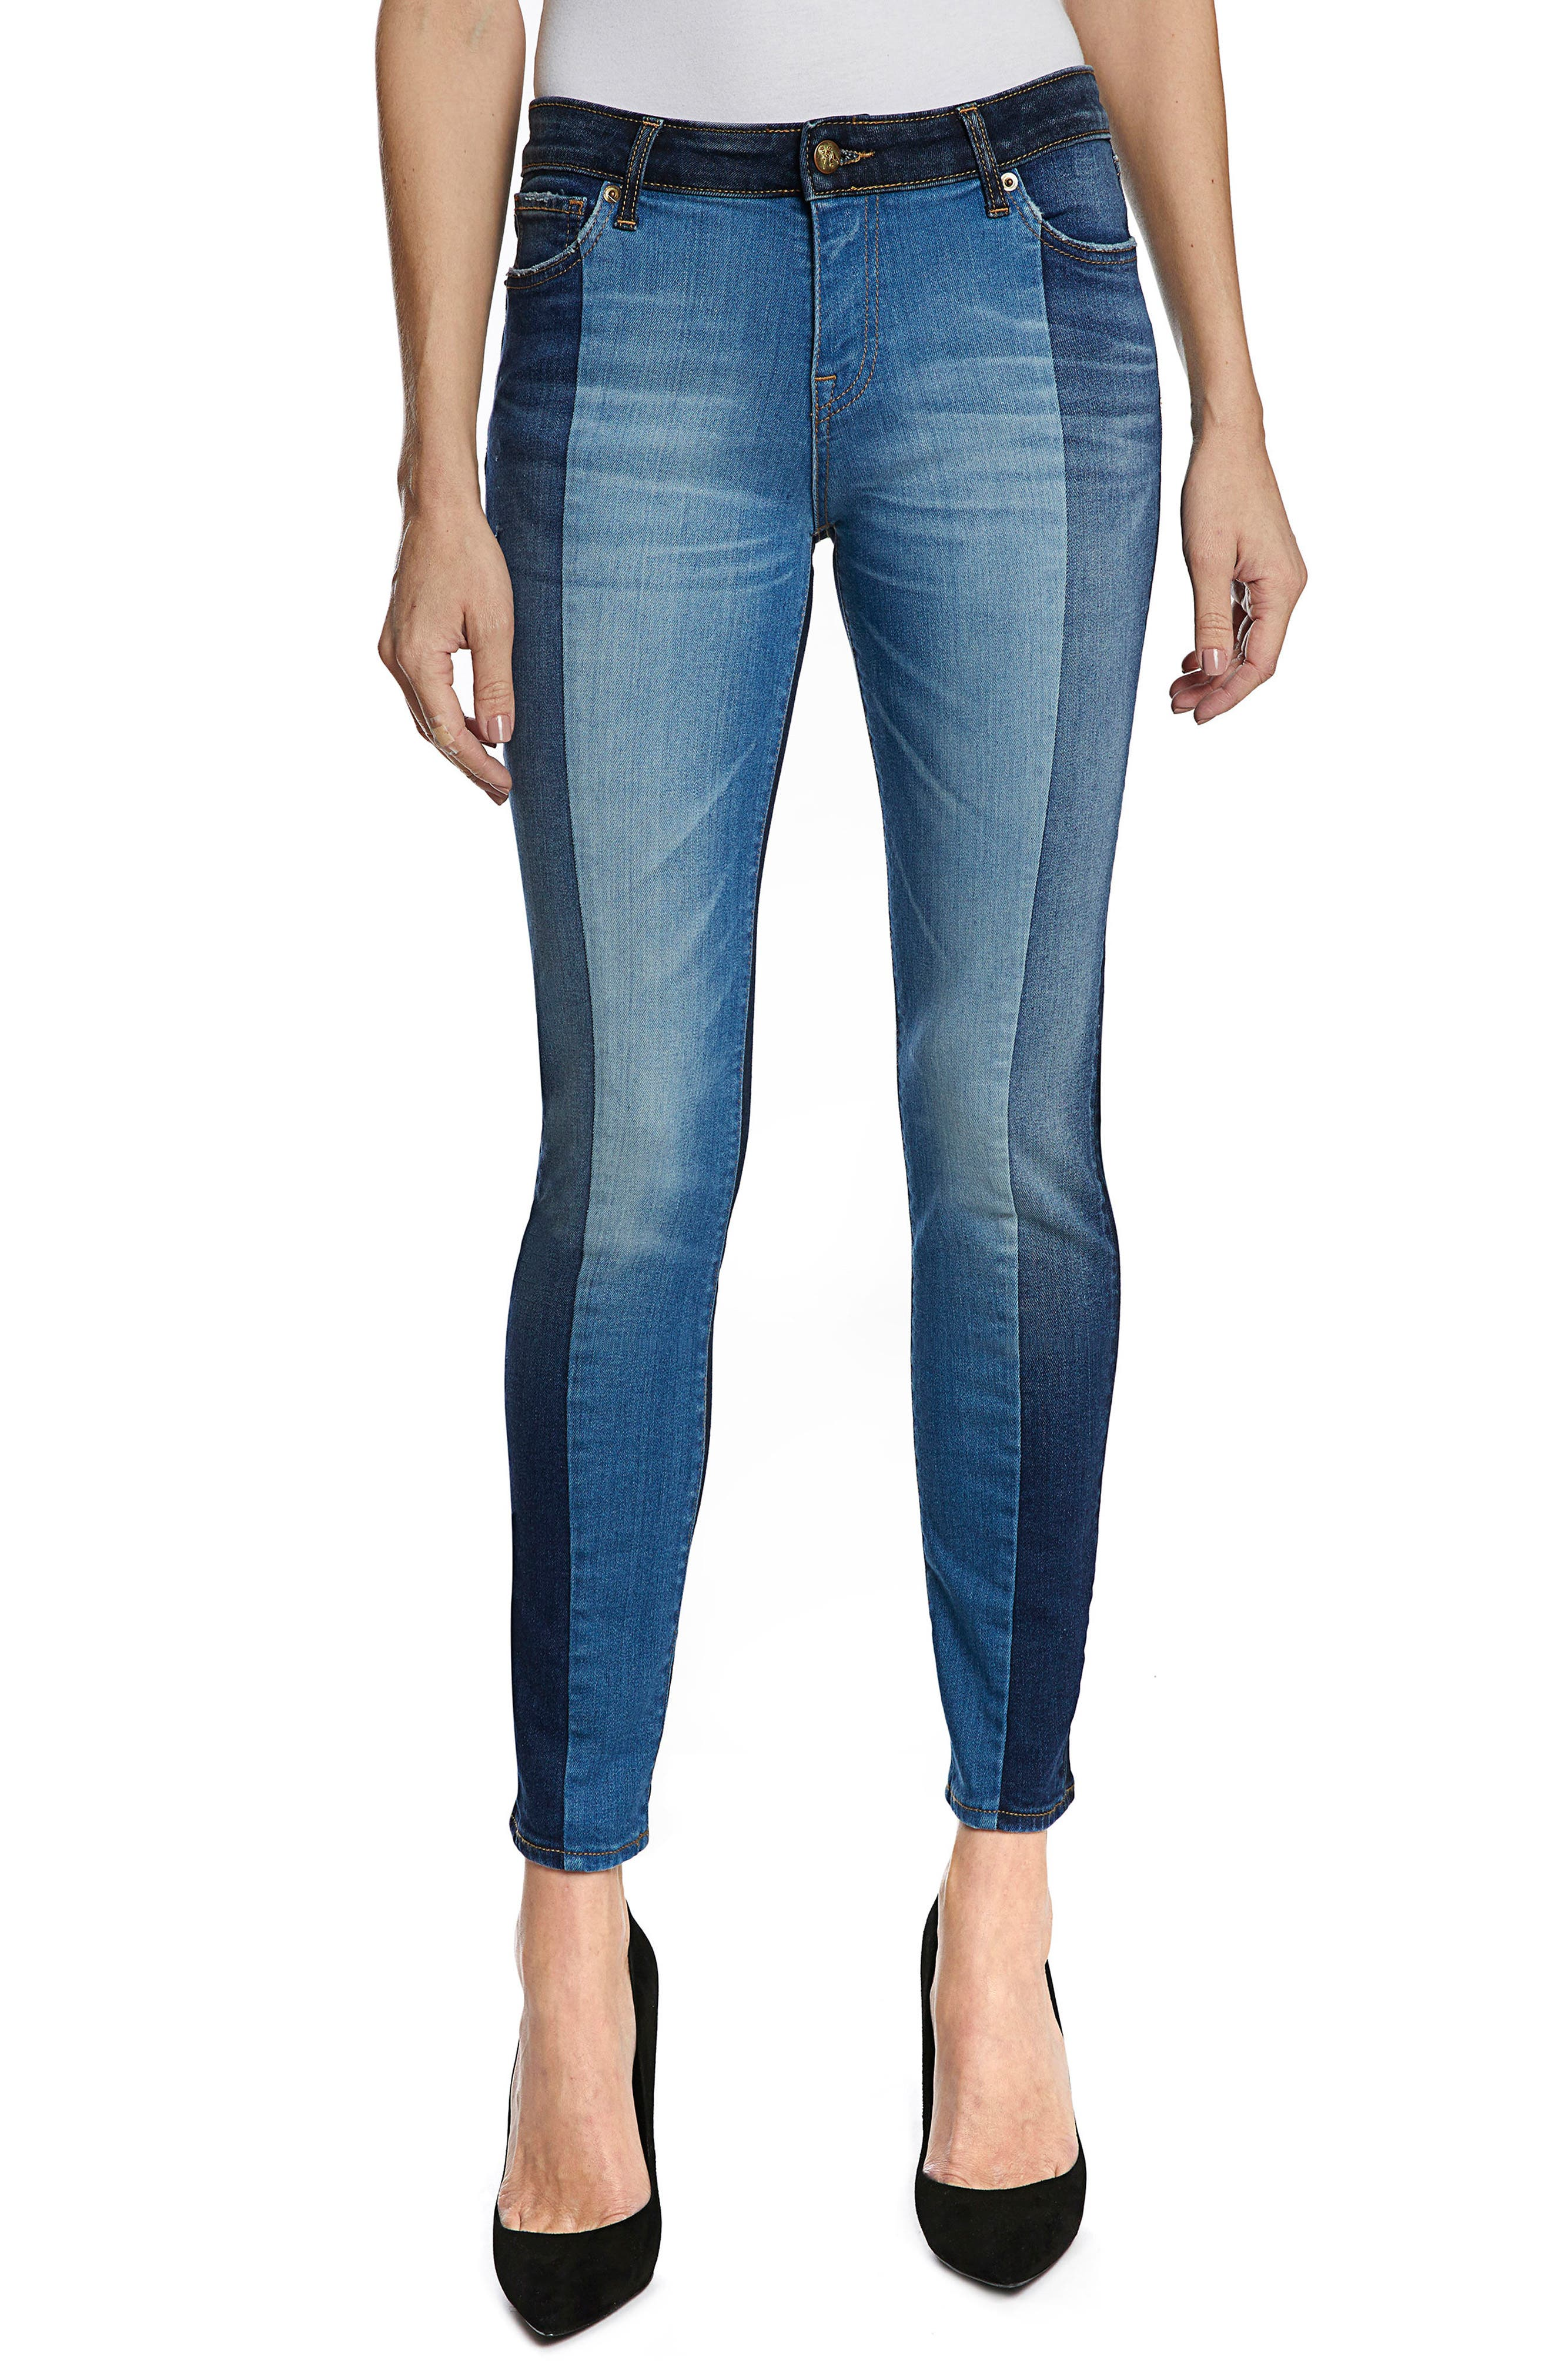 Camaro Ankle Skinny Jeans,                             Main thumbnail 1, color,                             Indigo